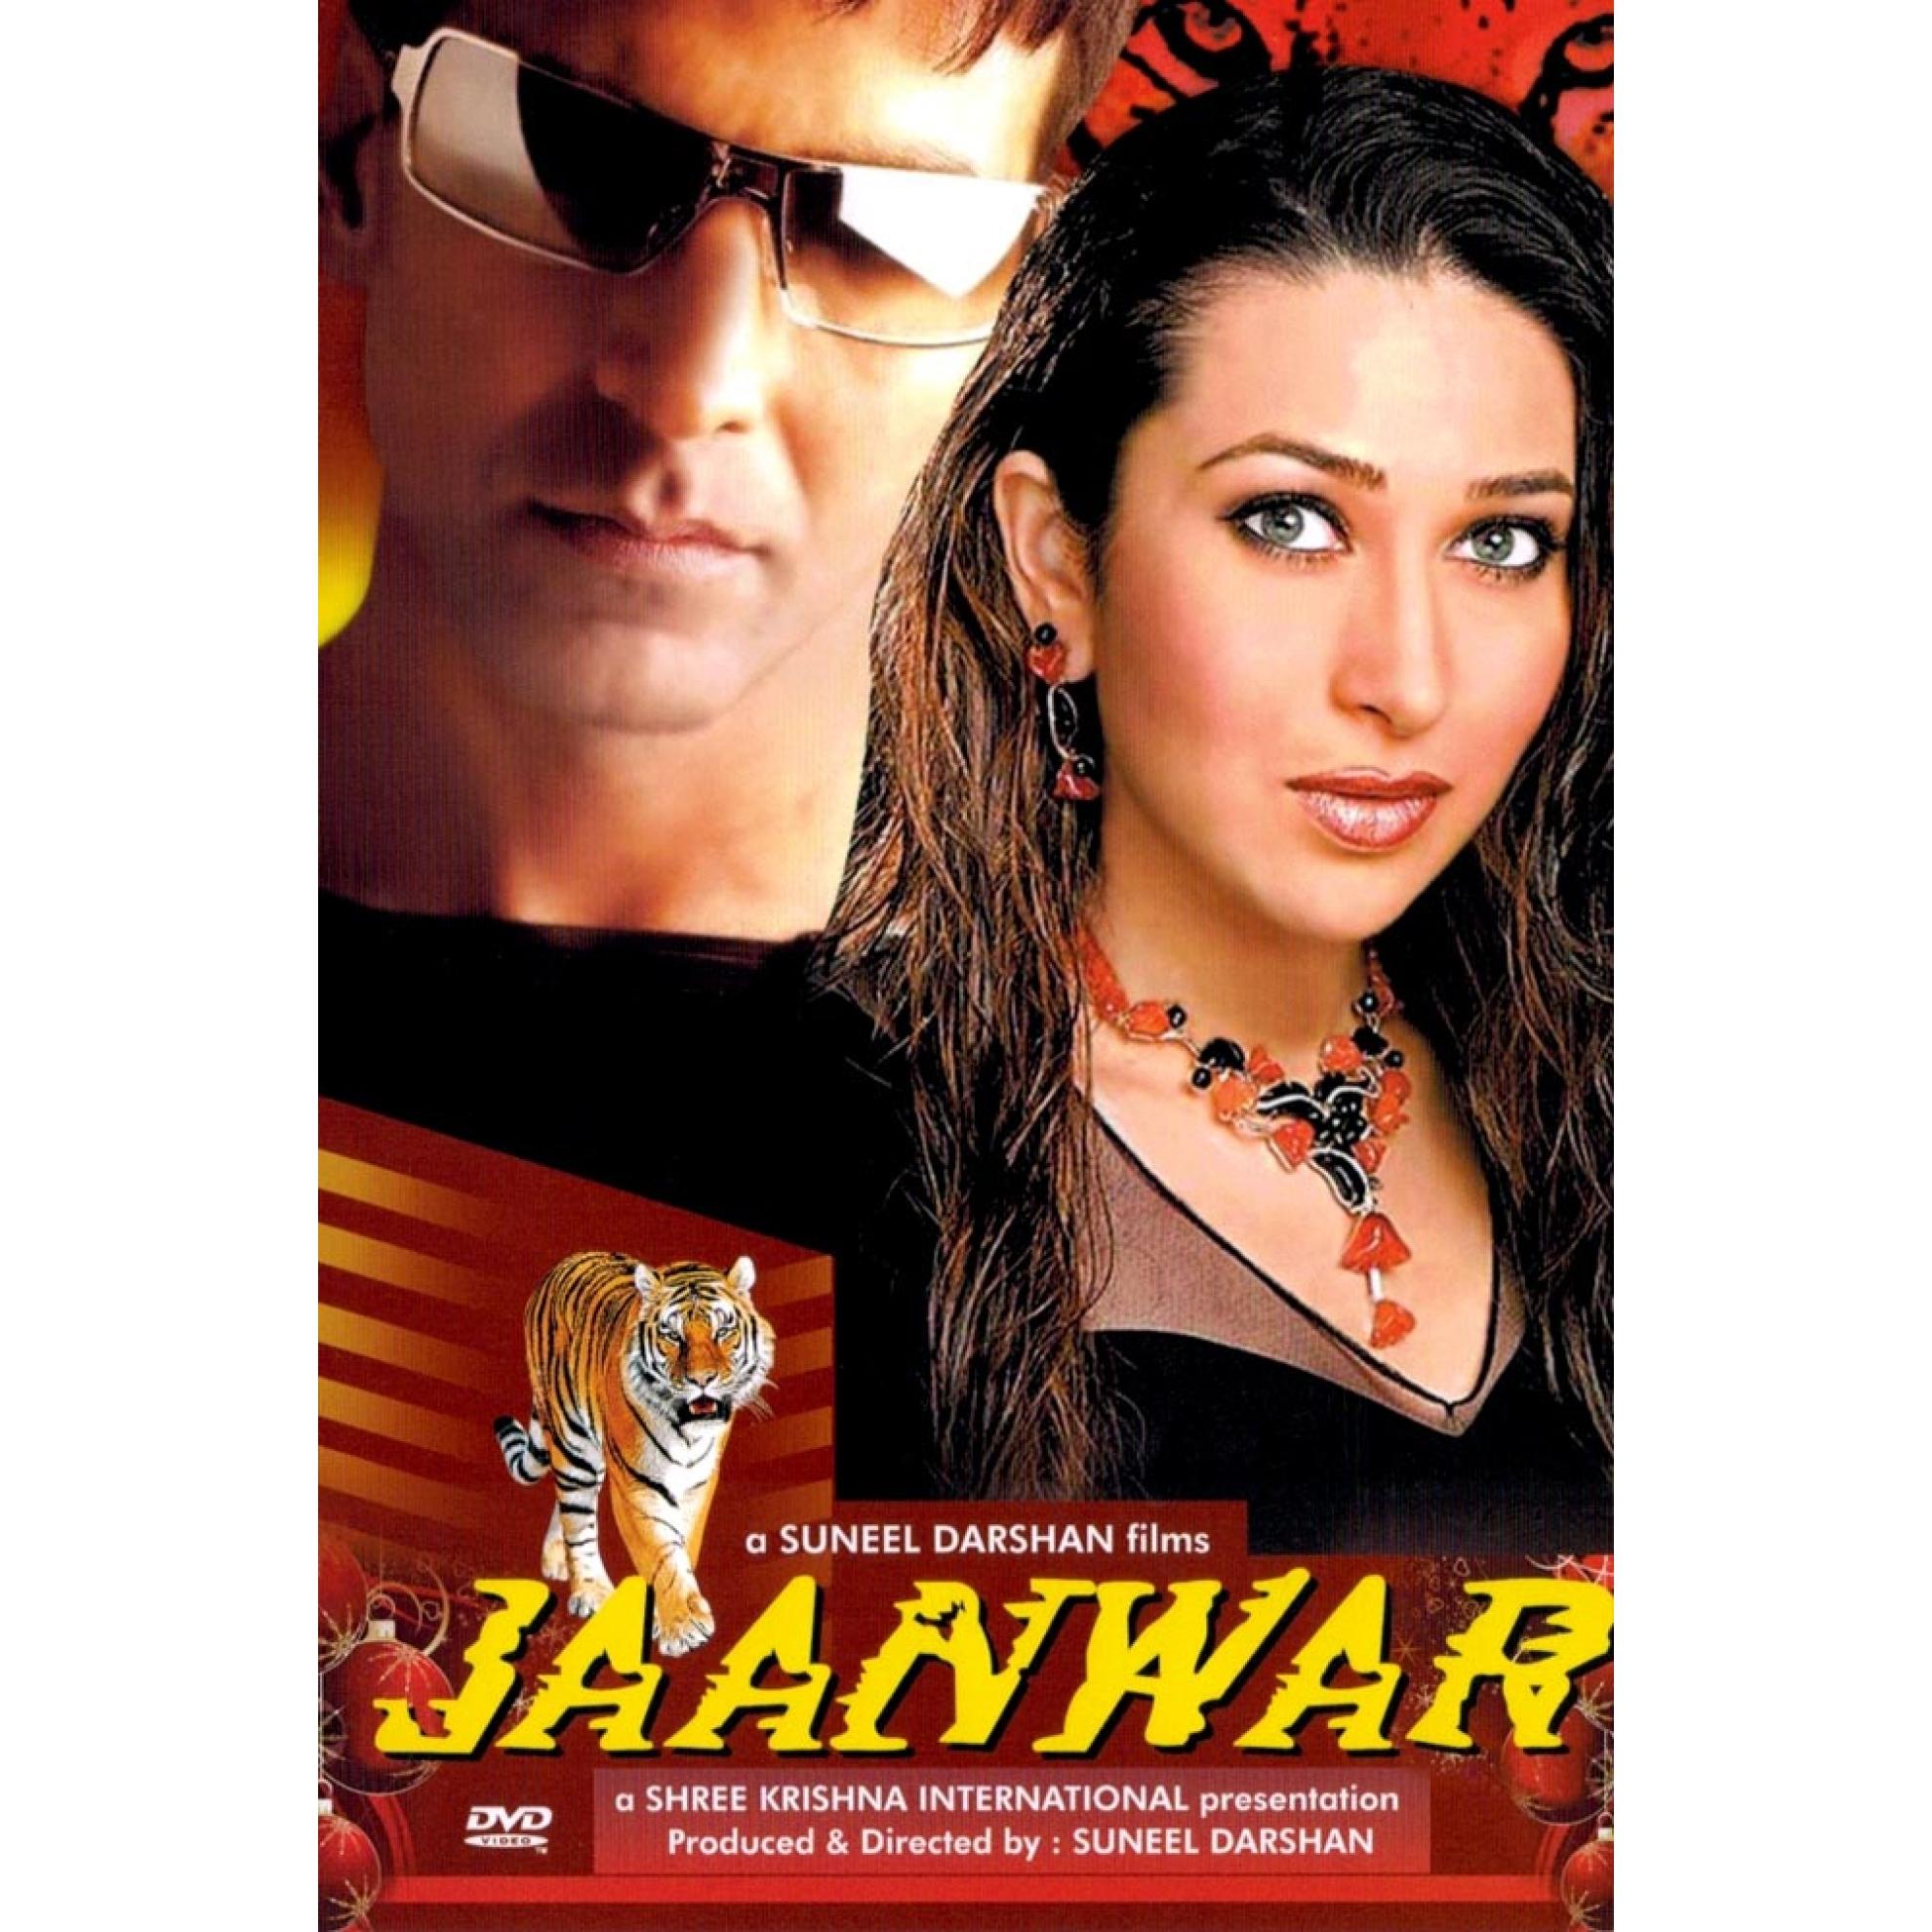 Happy new year hd photo hindi movie shahrukh khan download